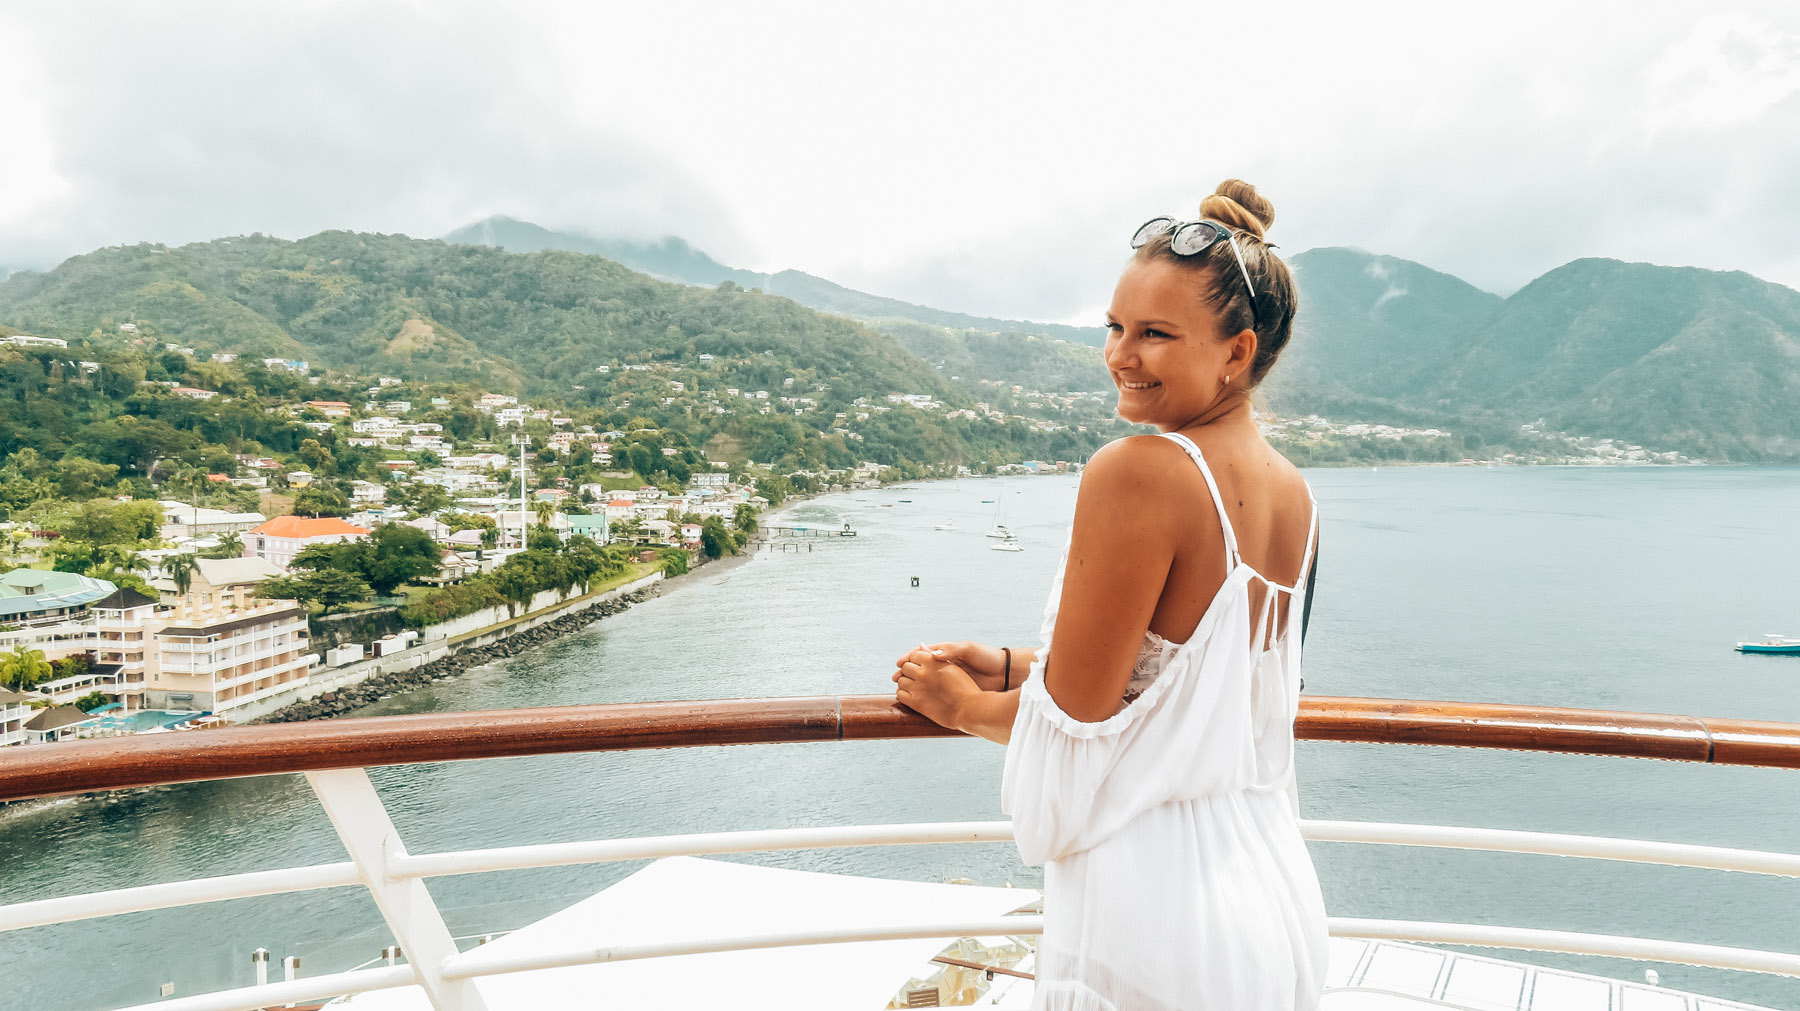 Dominica Karibik Kreuzfahrt Aussicht Schiff